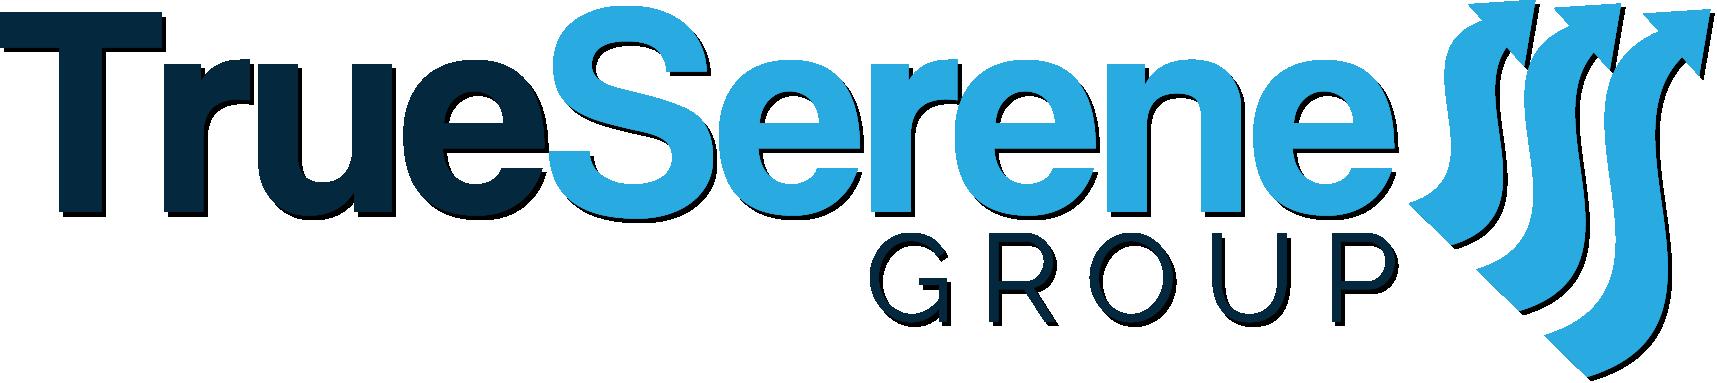 True Serene Group